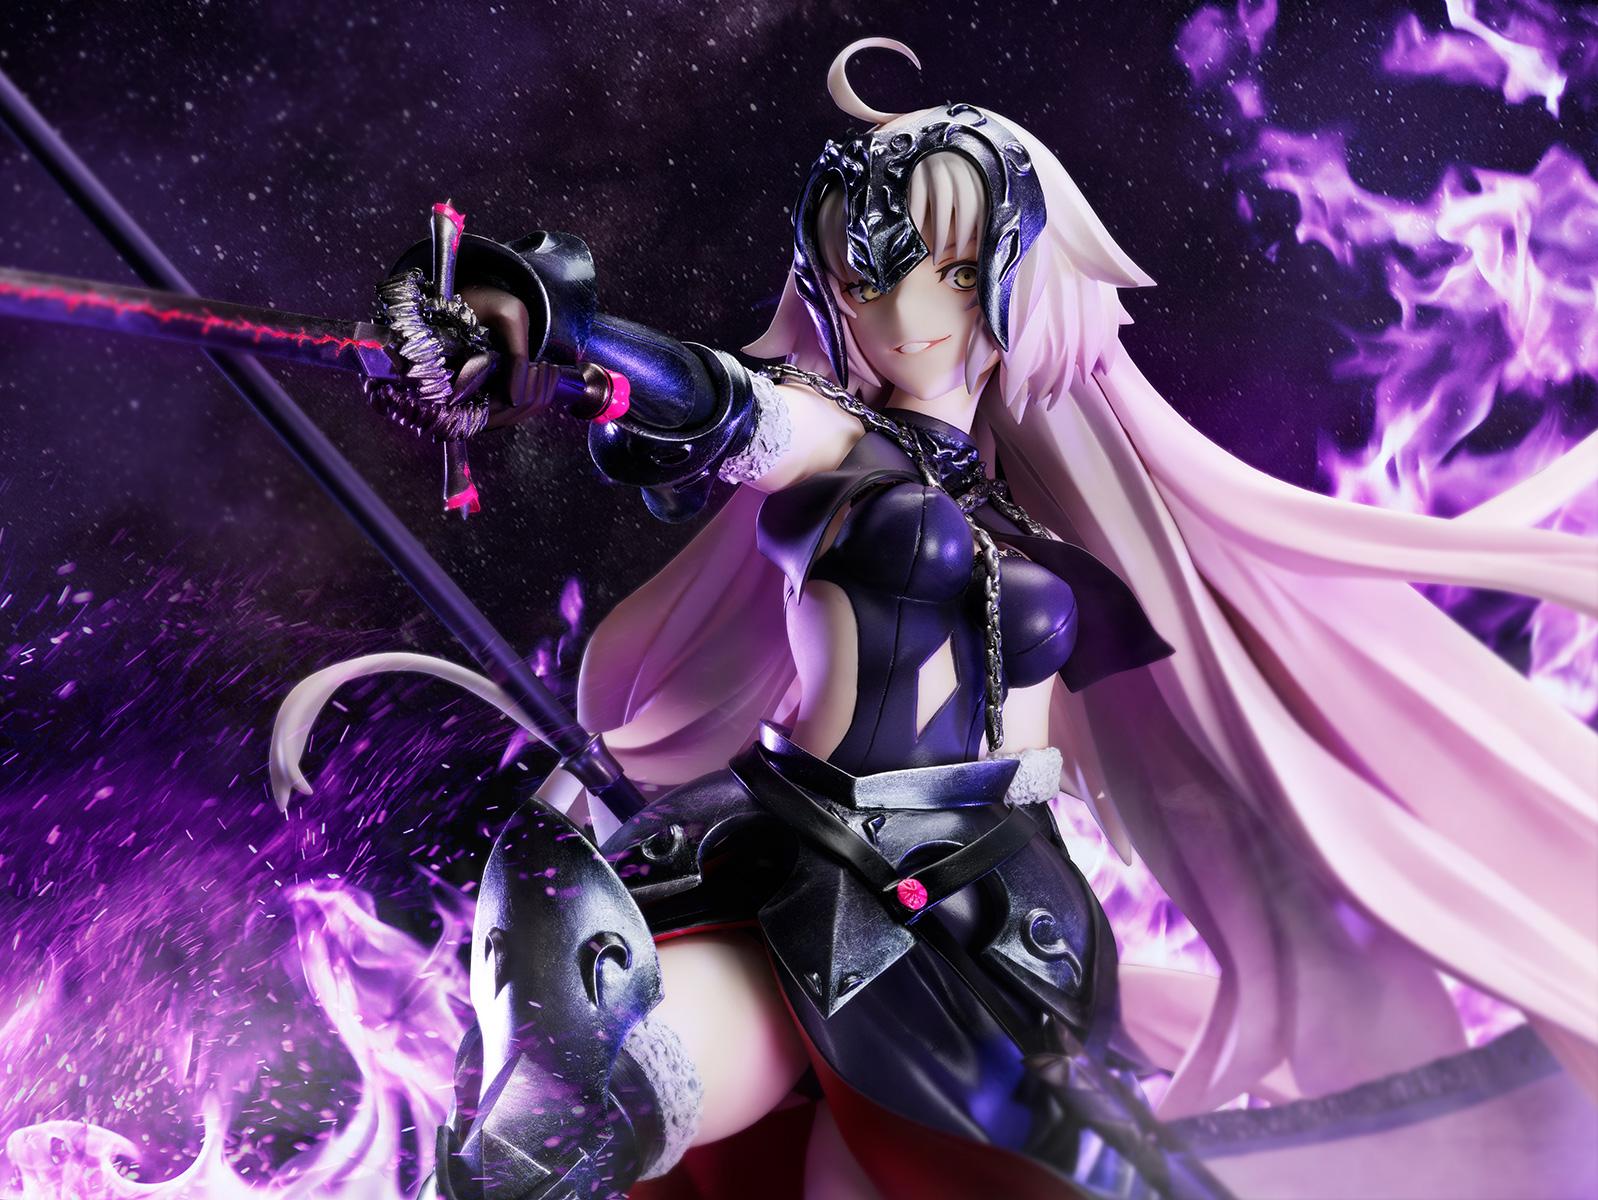 FateGrand Order アヴェンジャージャンヌ・ダルク[オルタ] 昏き焔を纏いし竜の魔女 17 完成品フィギュアFIGURE-055727_08